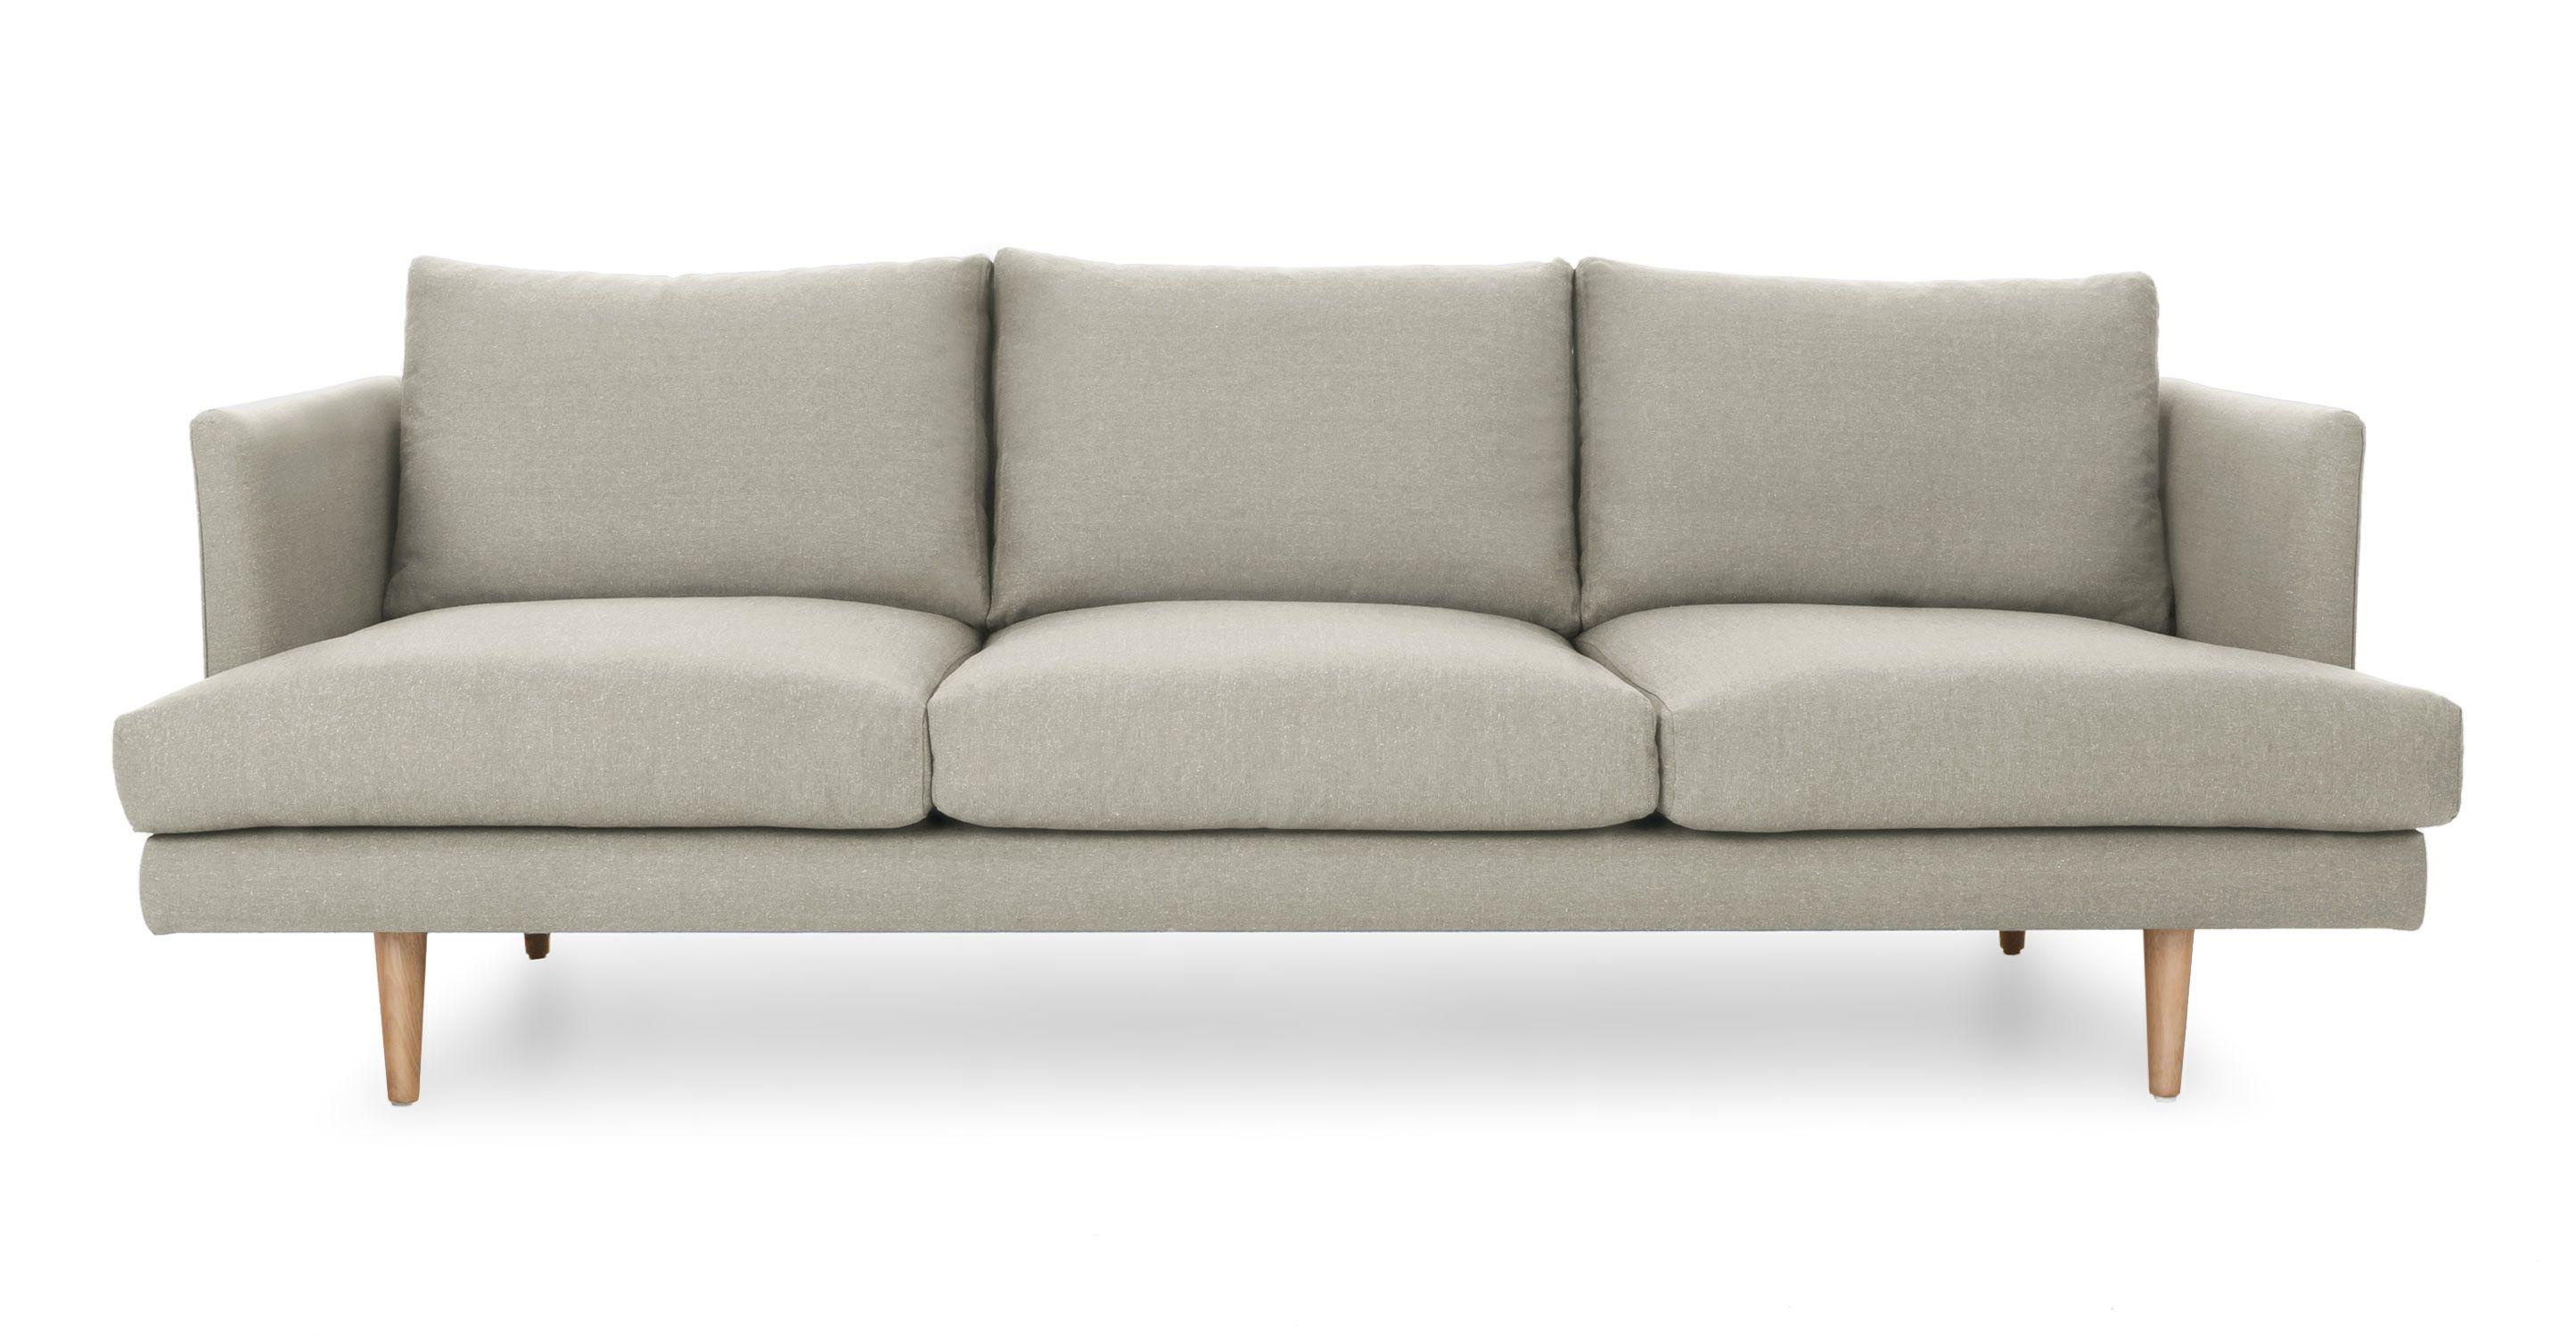 Carl Cobble Gray Sofa budget rooms for blog Pinterest